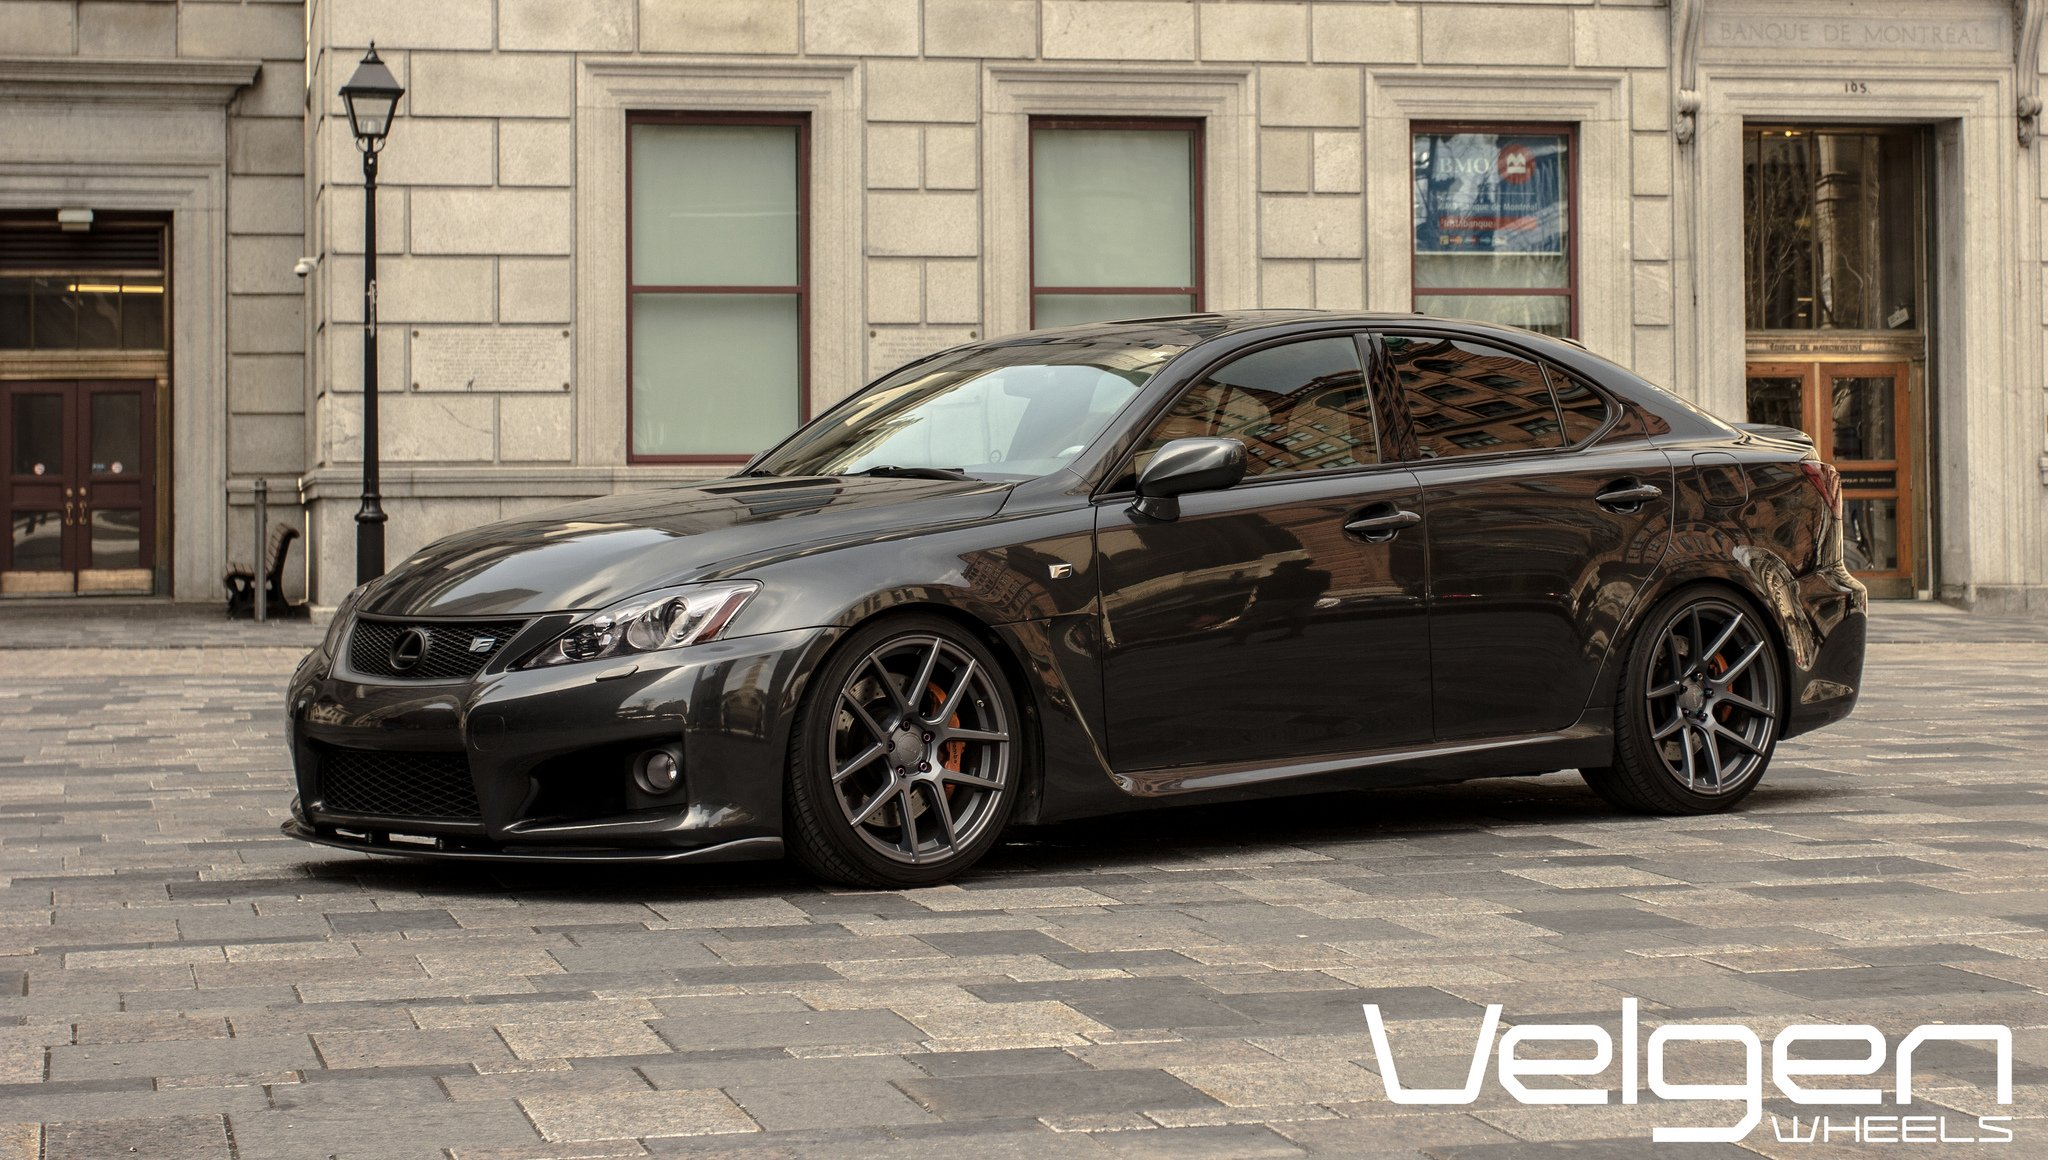 Lexus ISF cars tuning Velgen Wheels wallpaper | 2048x1160 | 502891 ...